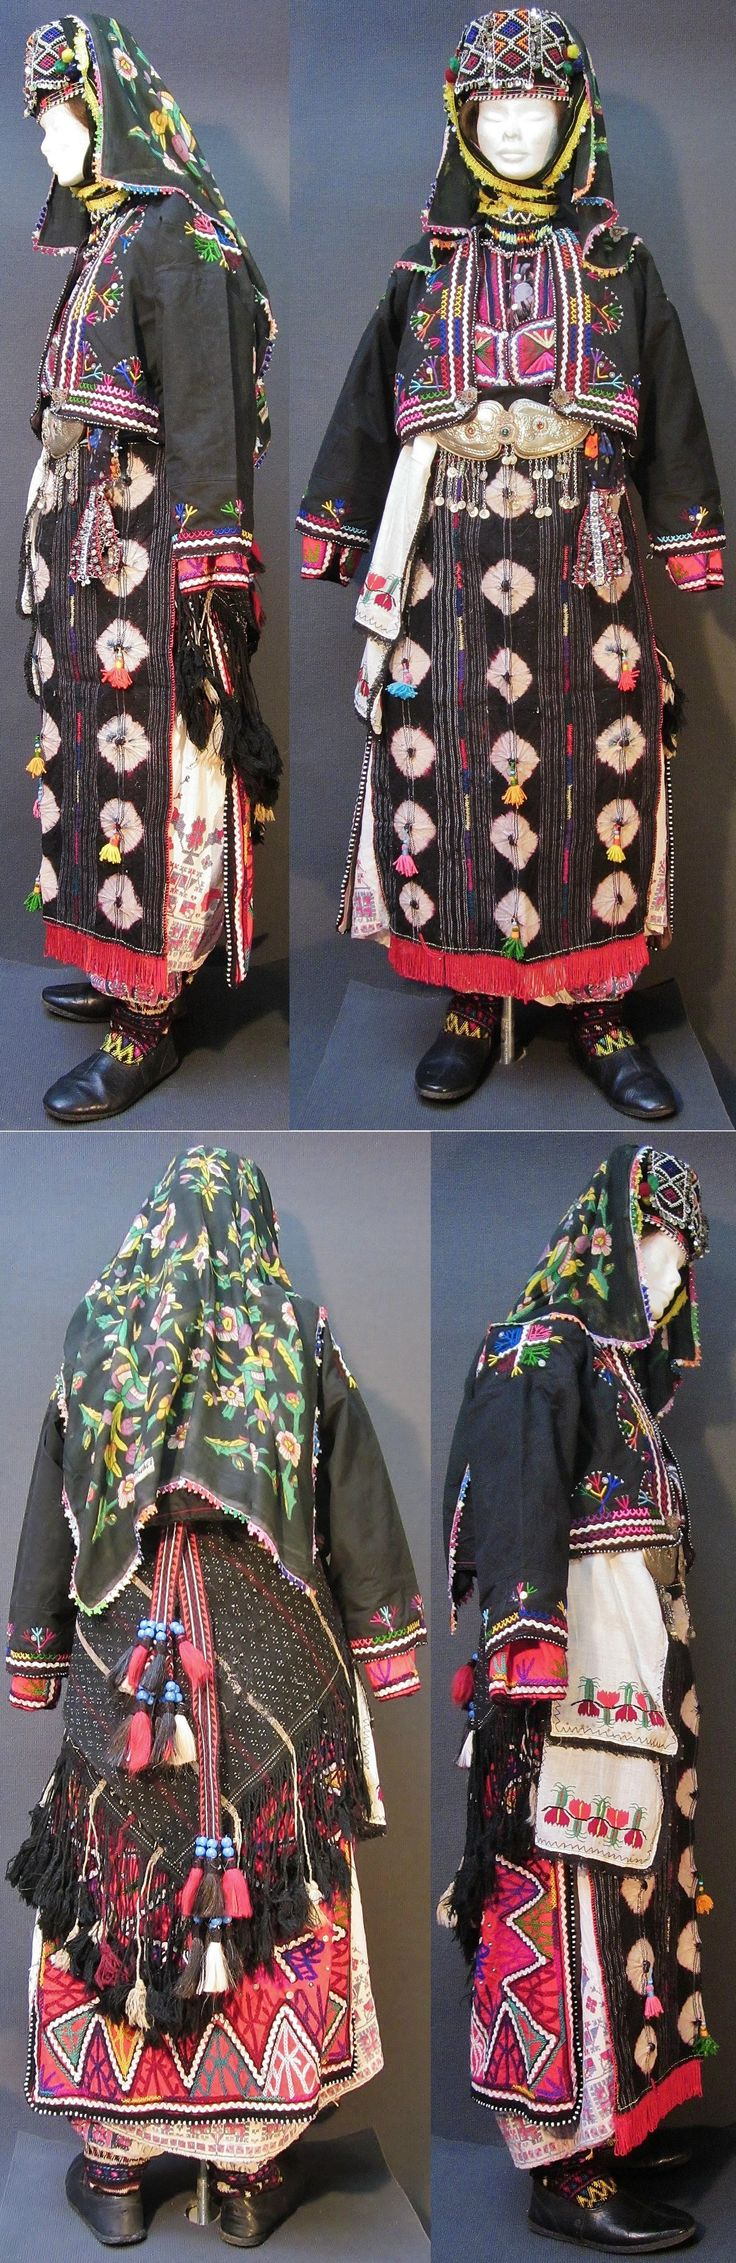 A traditional festive costume from the Karakeçeli (Yörük) villages of the Keles district (south of Bursa).  Ca. 1950-1985.  (Kavak Costume Collection - Antwerpen/Belgium).